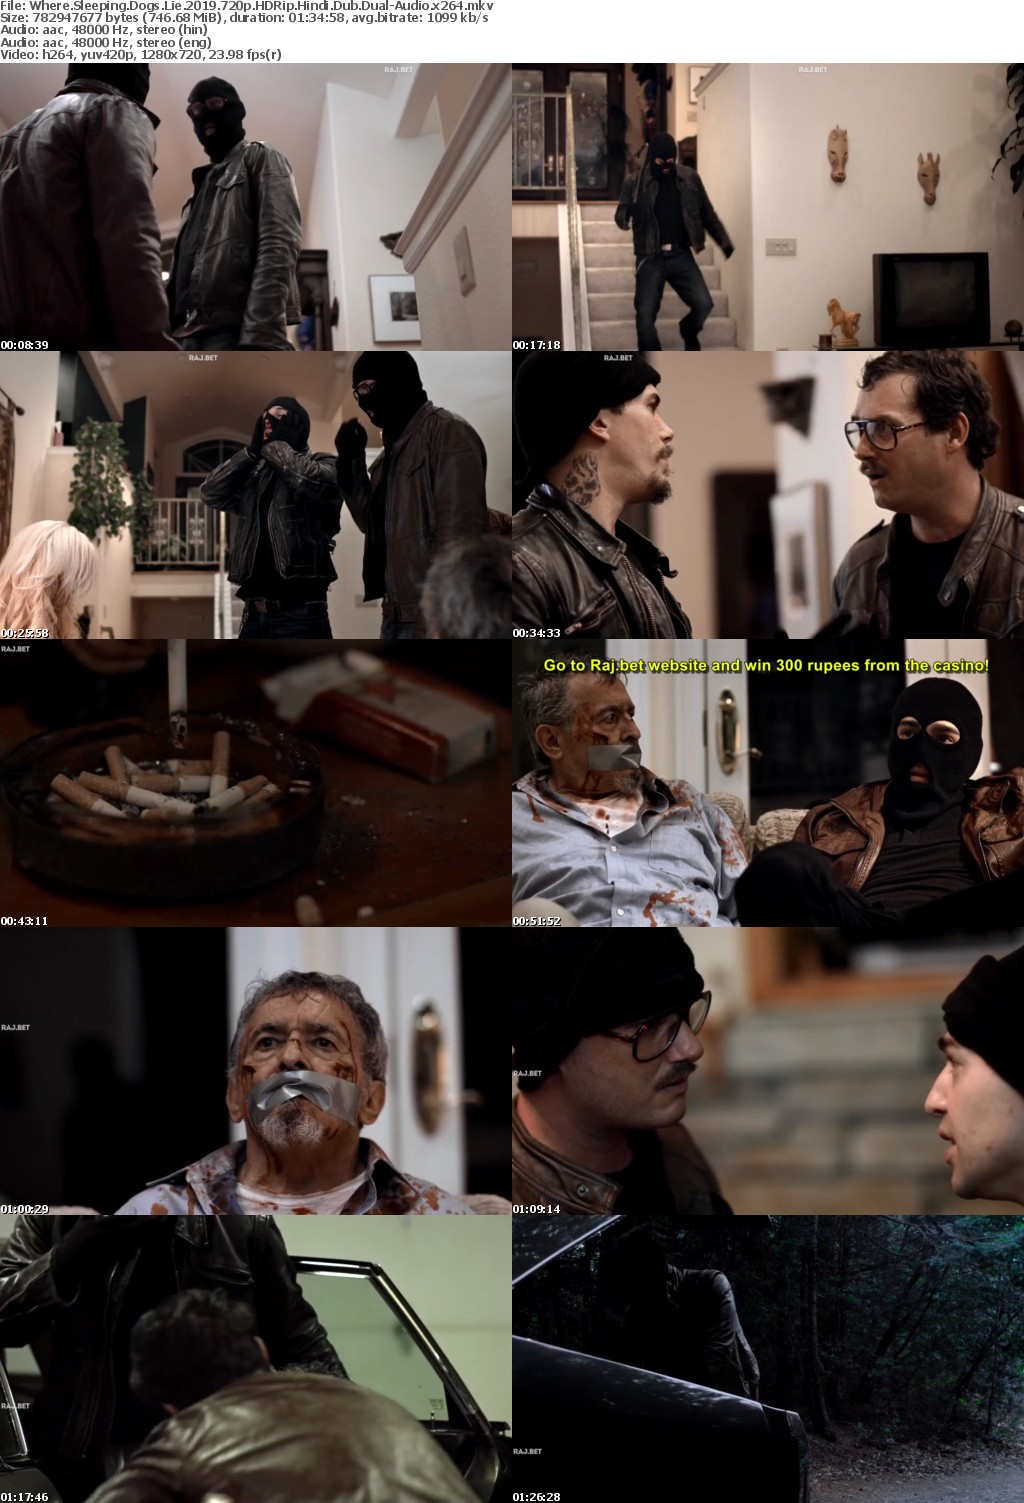 Where Sleeping Dogs Lie (2019) 720p HDRip Hindi-Dub Dual-Audio x264